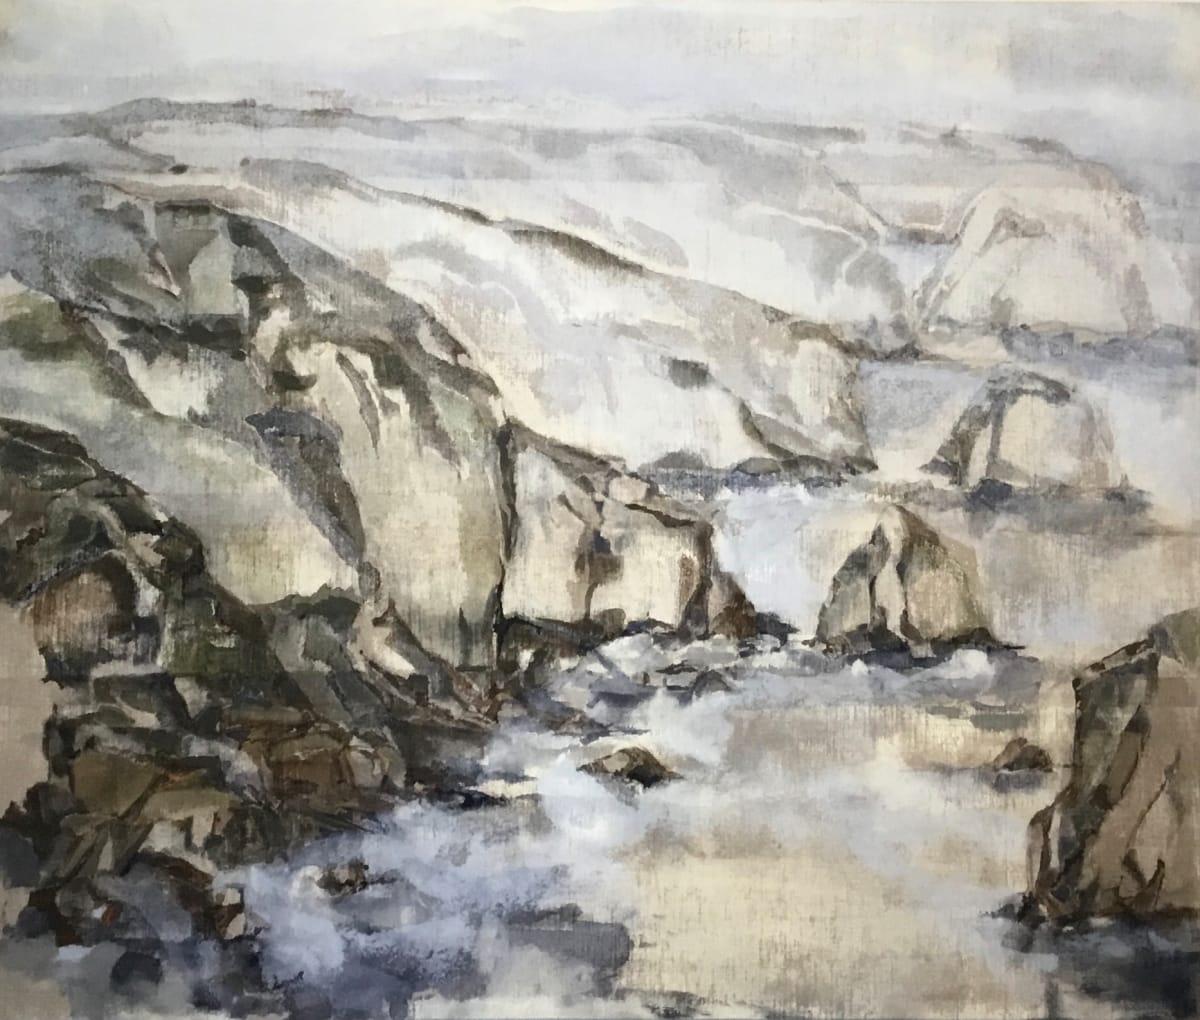 Edge, 3, Verso by Barbara Houston  Image: Artist's chop in lower right corner